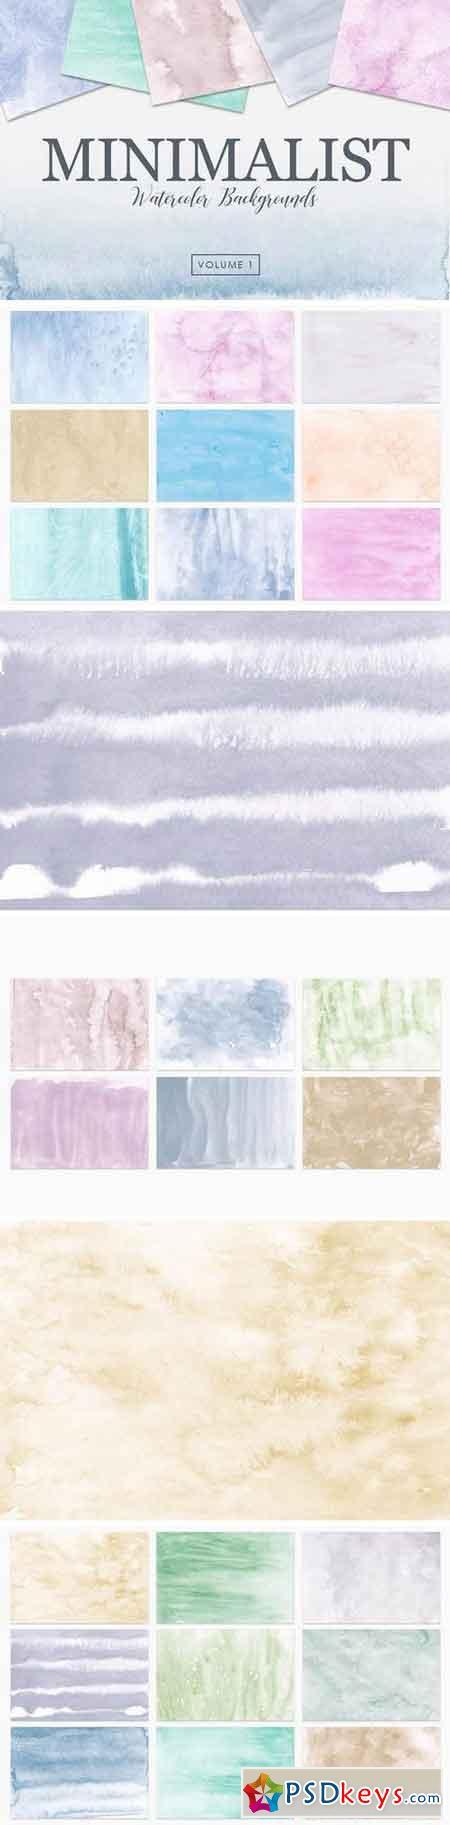 Minimalist Watercolor Backgrounds Vol 1